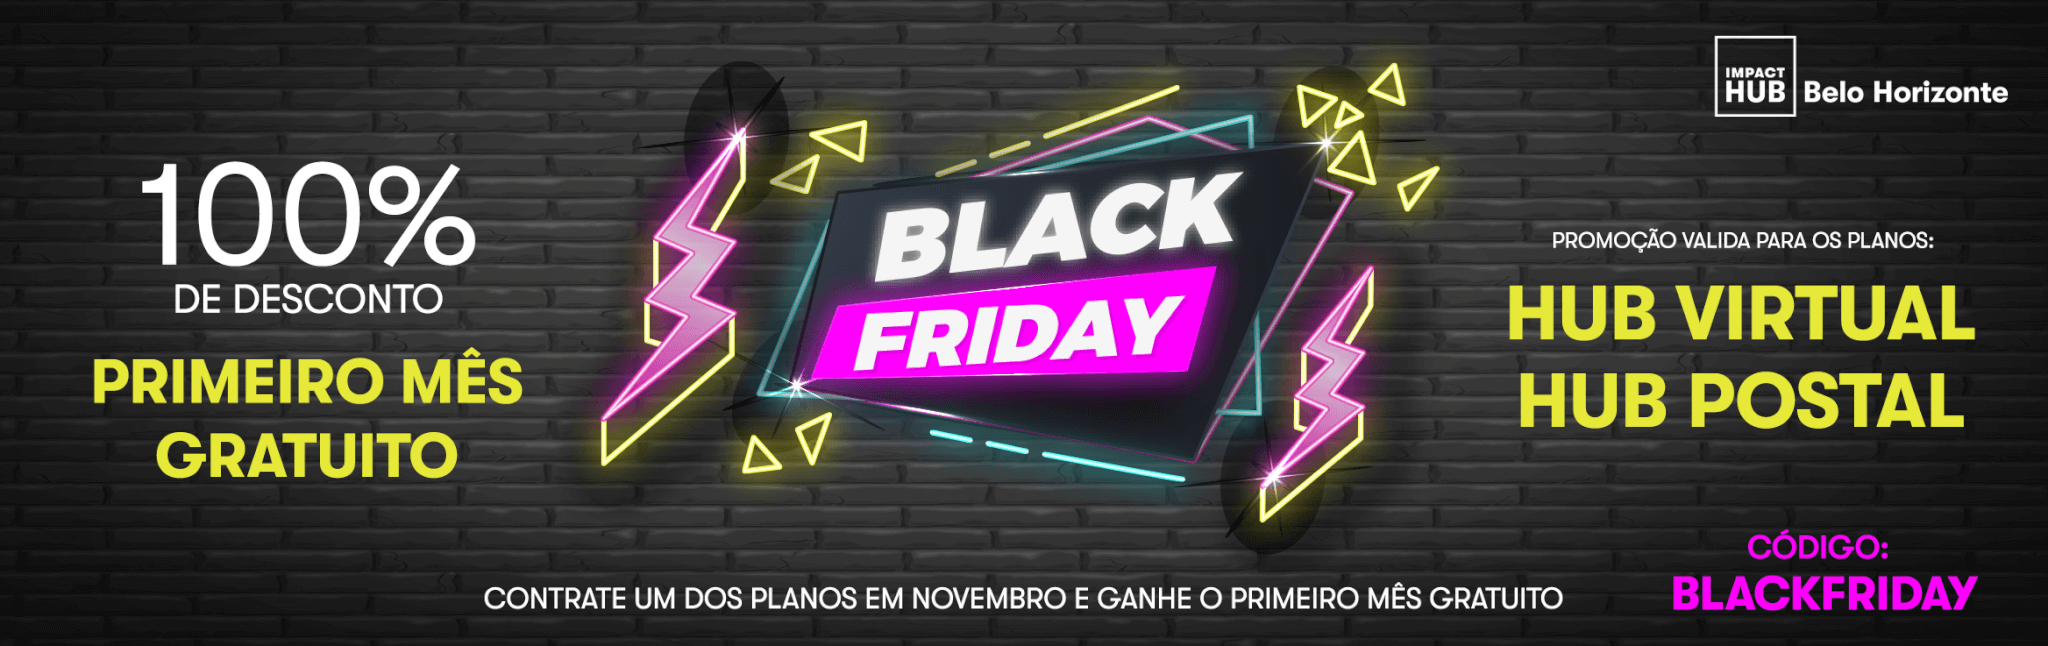 Black Friday empreendedorismo